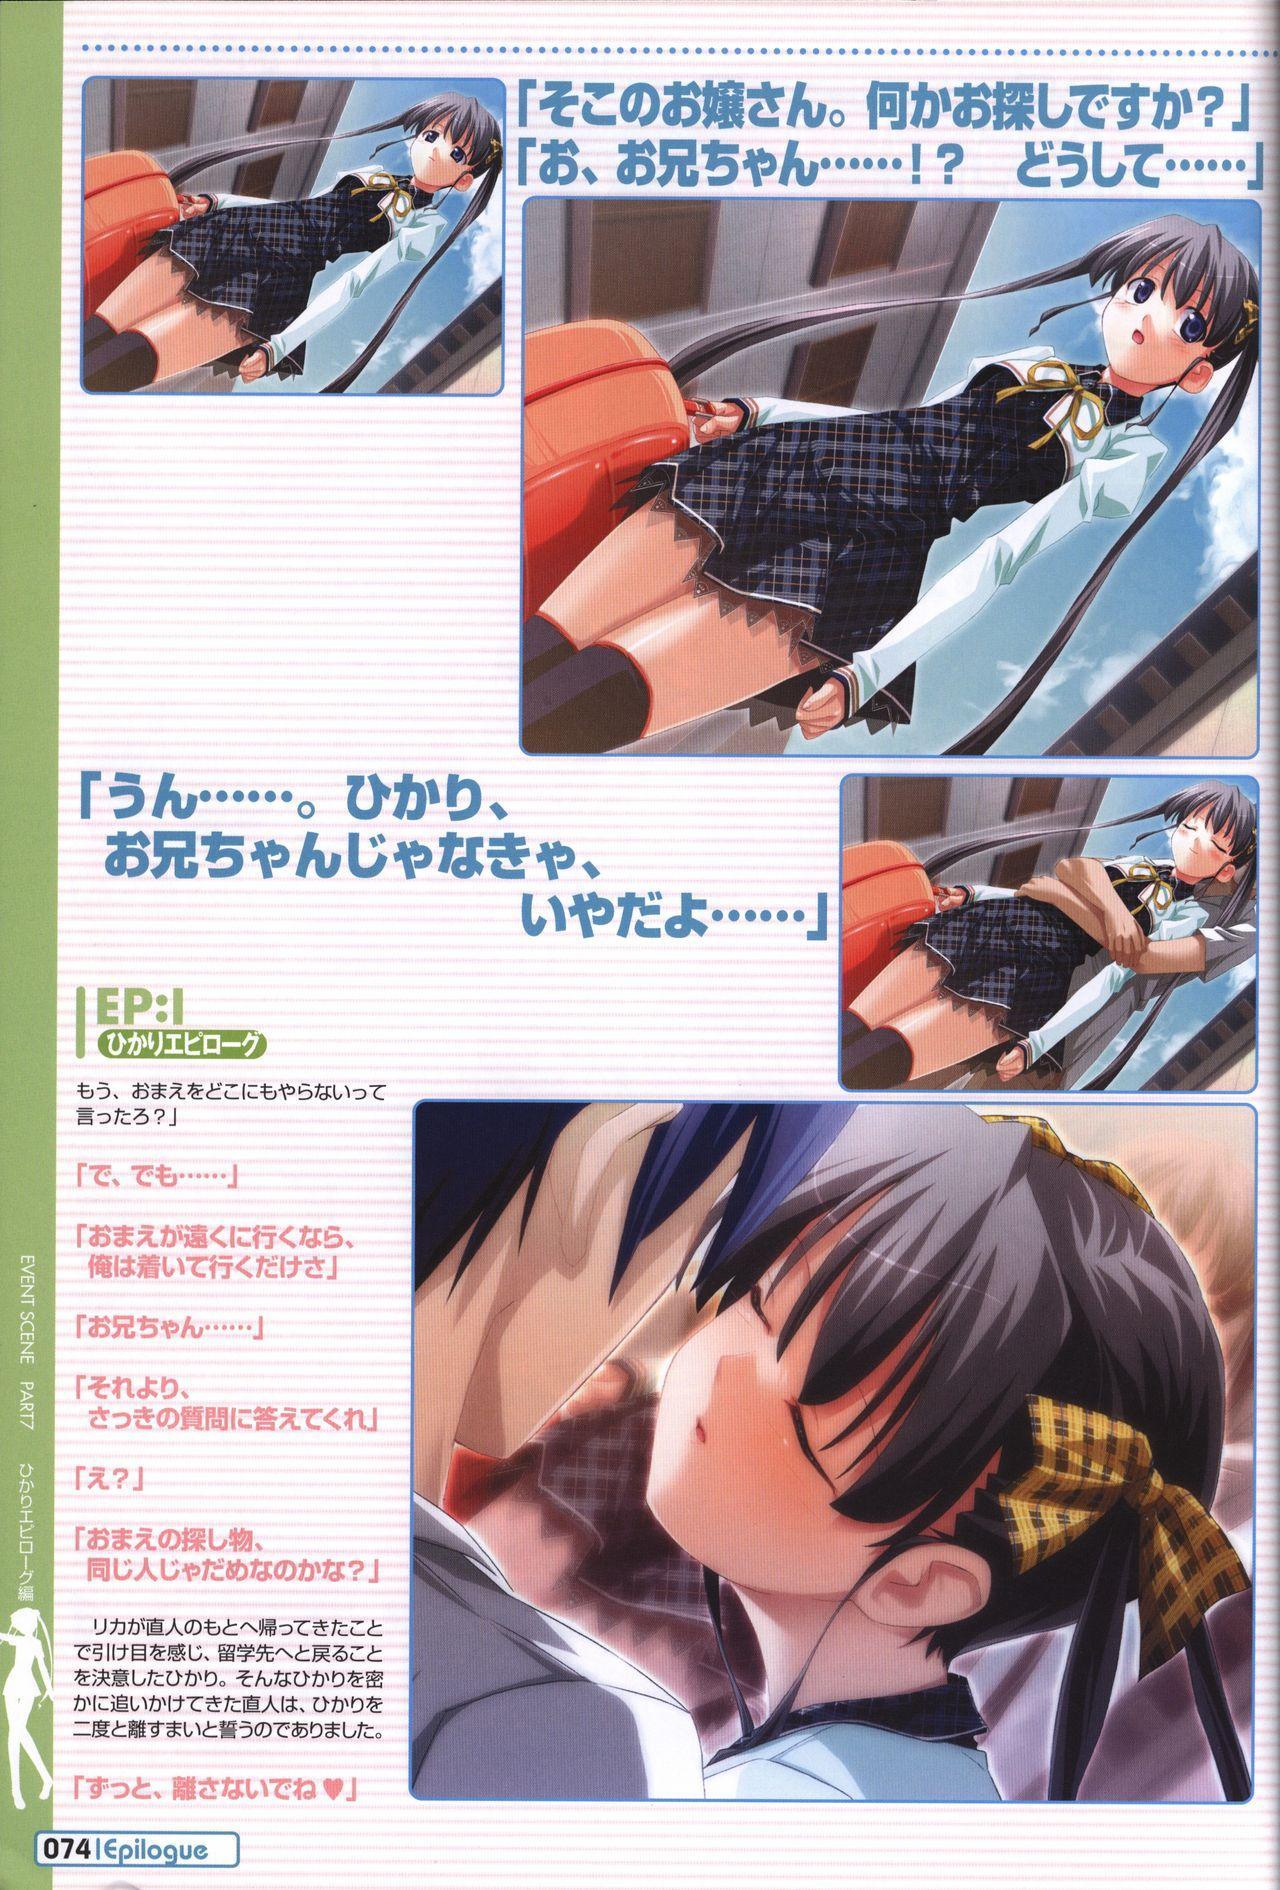 Makai Tenshi Jibril~EPISODE 2~ official fanbook 70